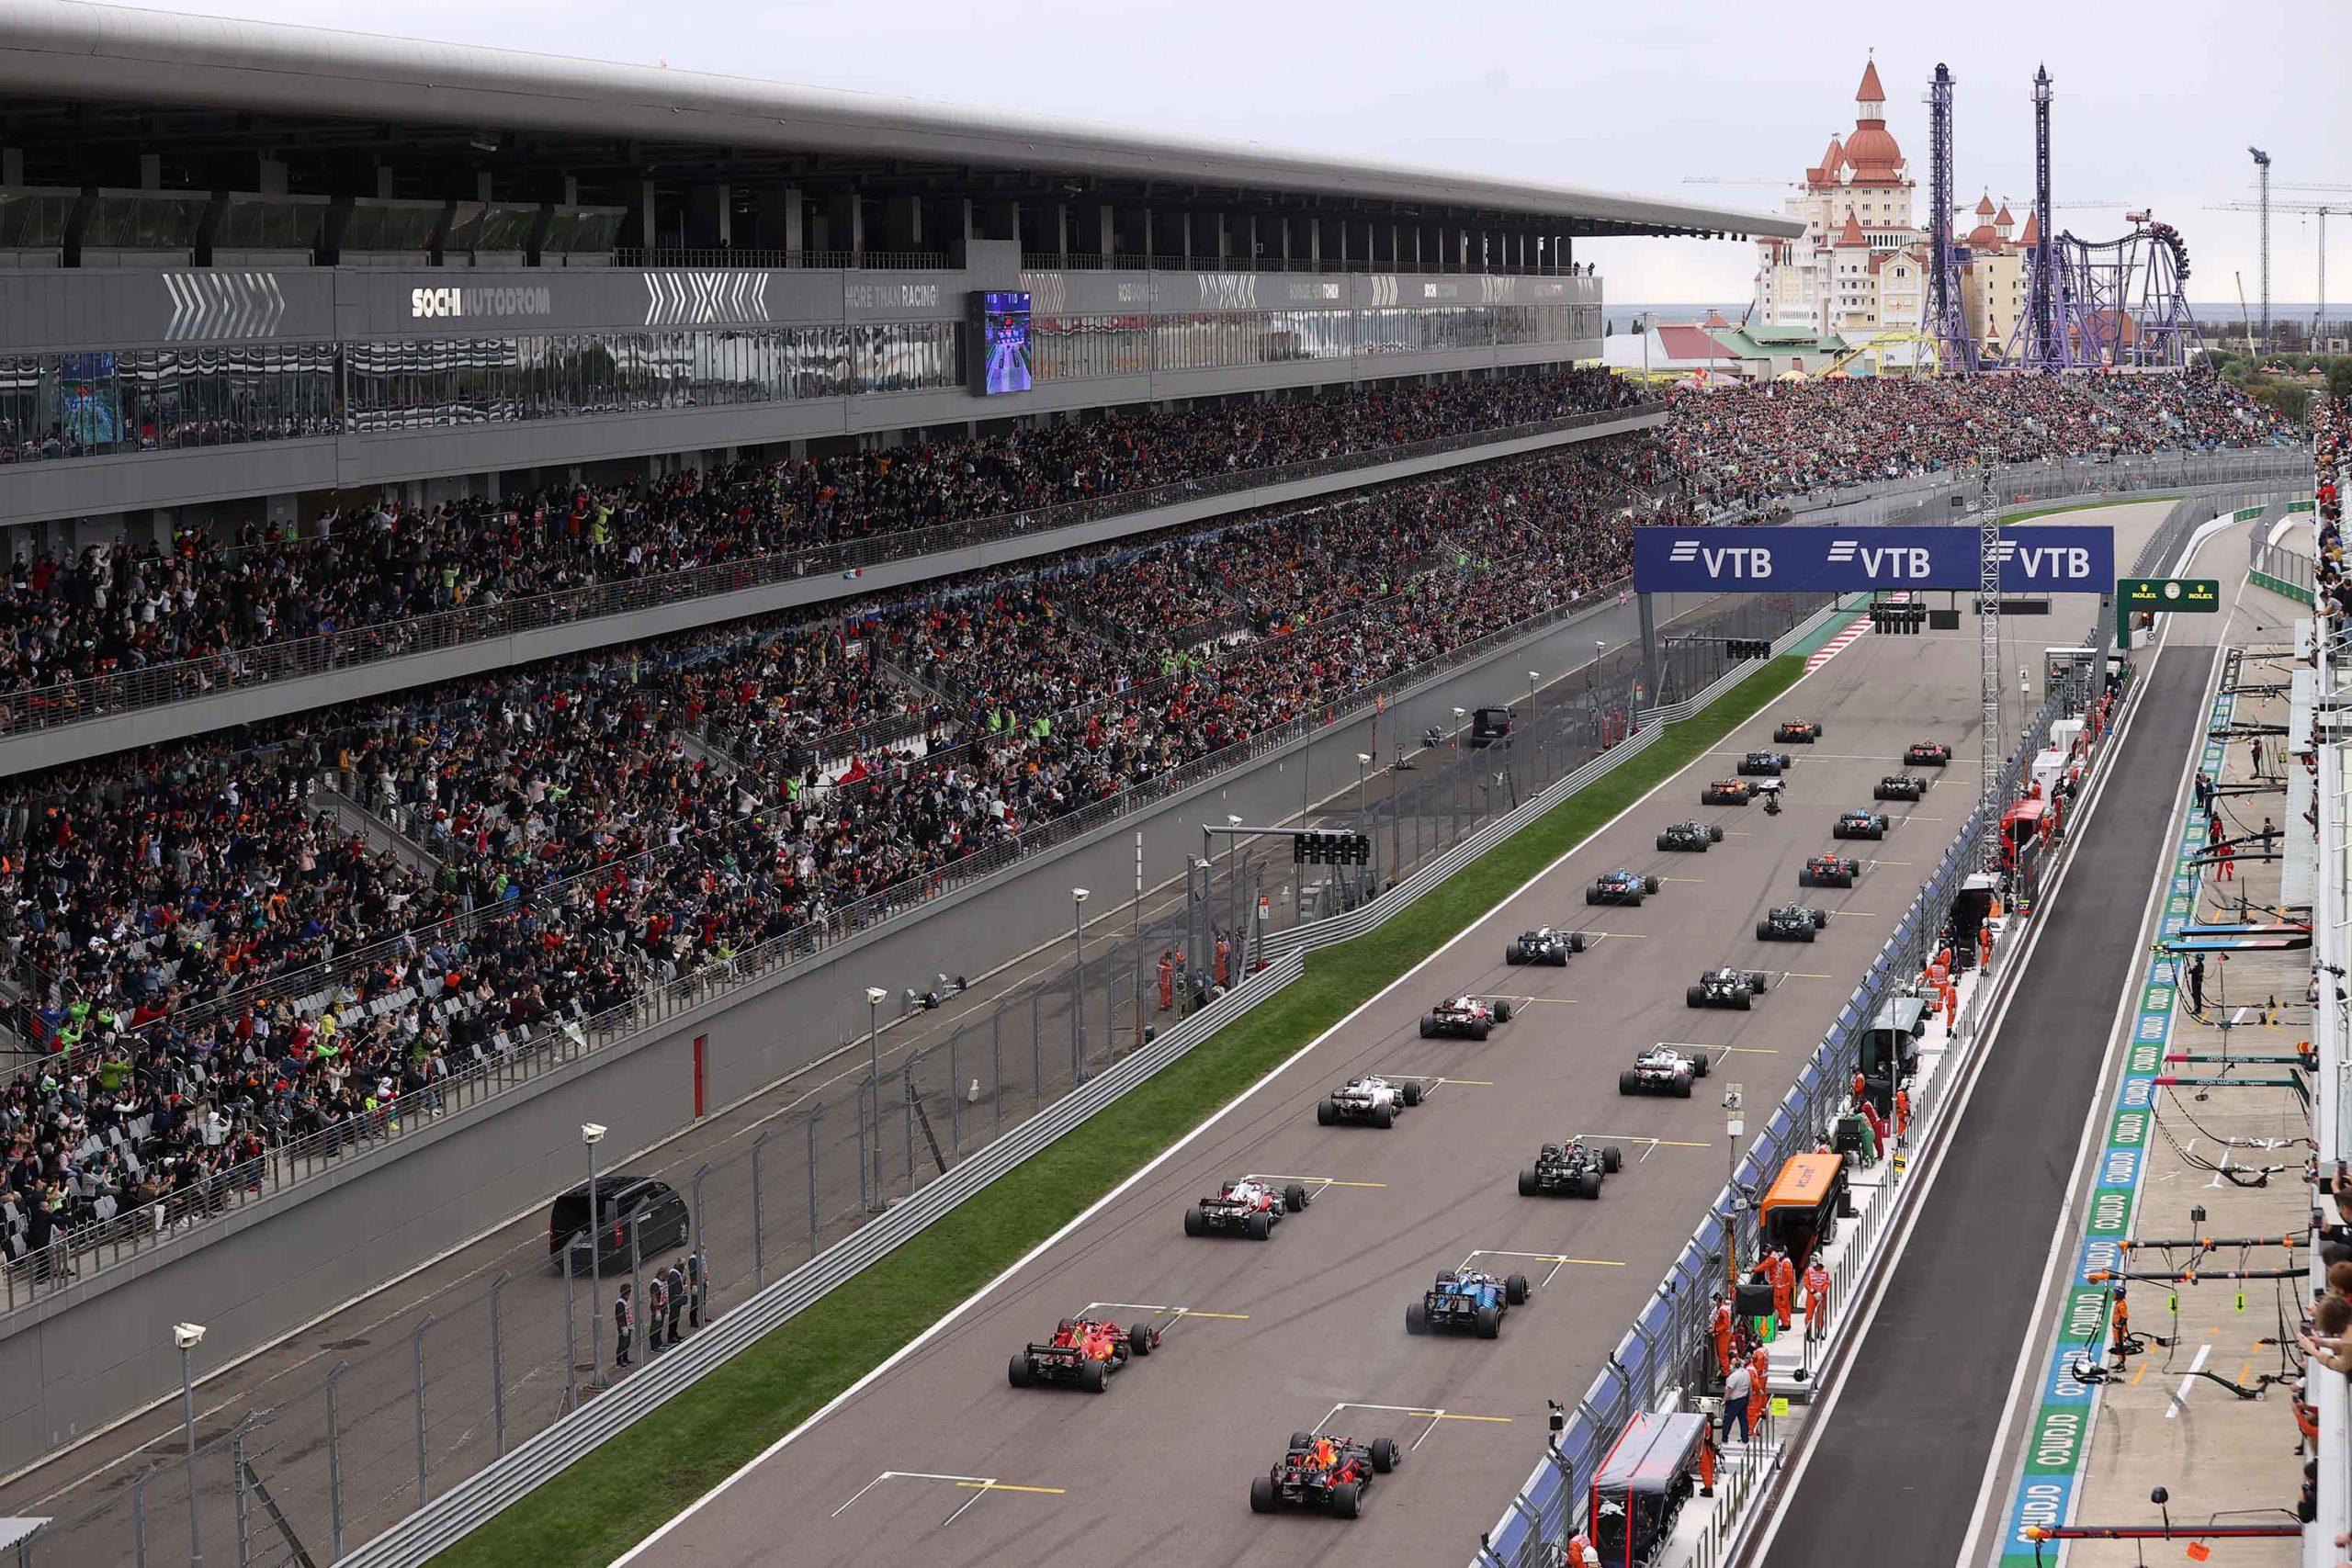 2021-Russian-Grand-Prix-starting-grid